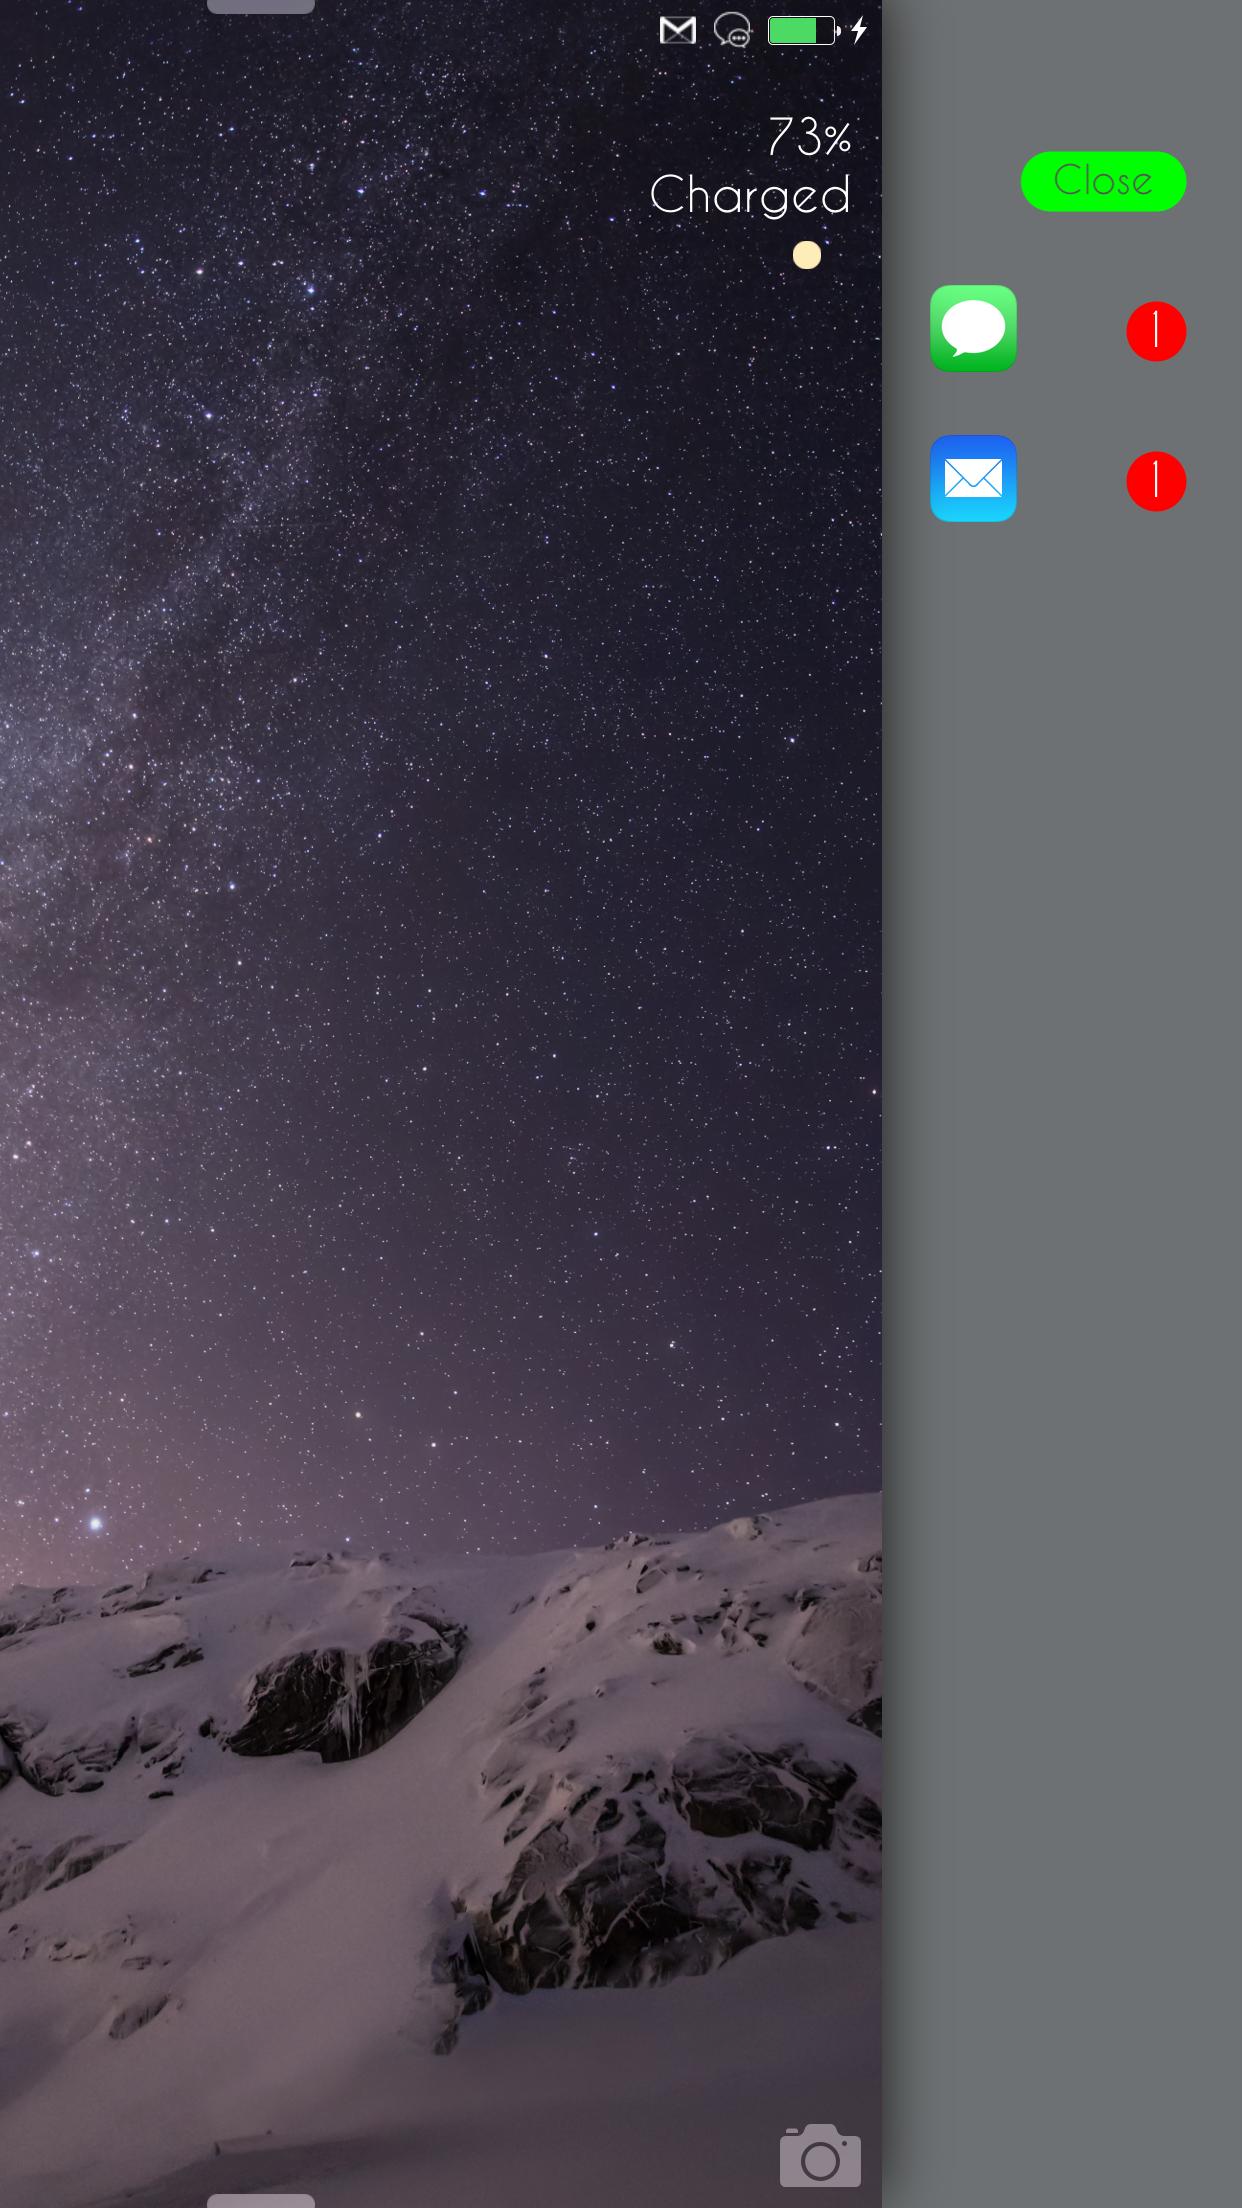 JAILBREAK CYDIA DOWNLAOD - Download Pangu for iOS 935